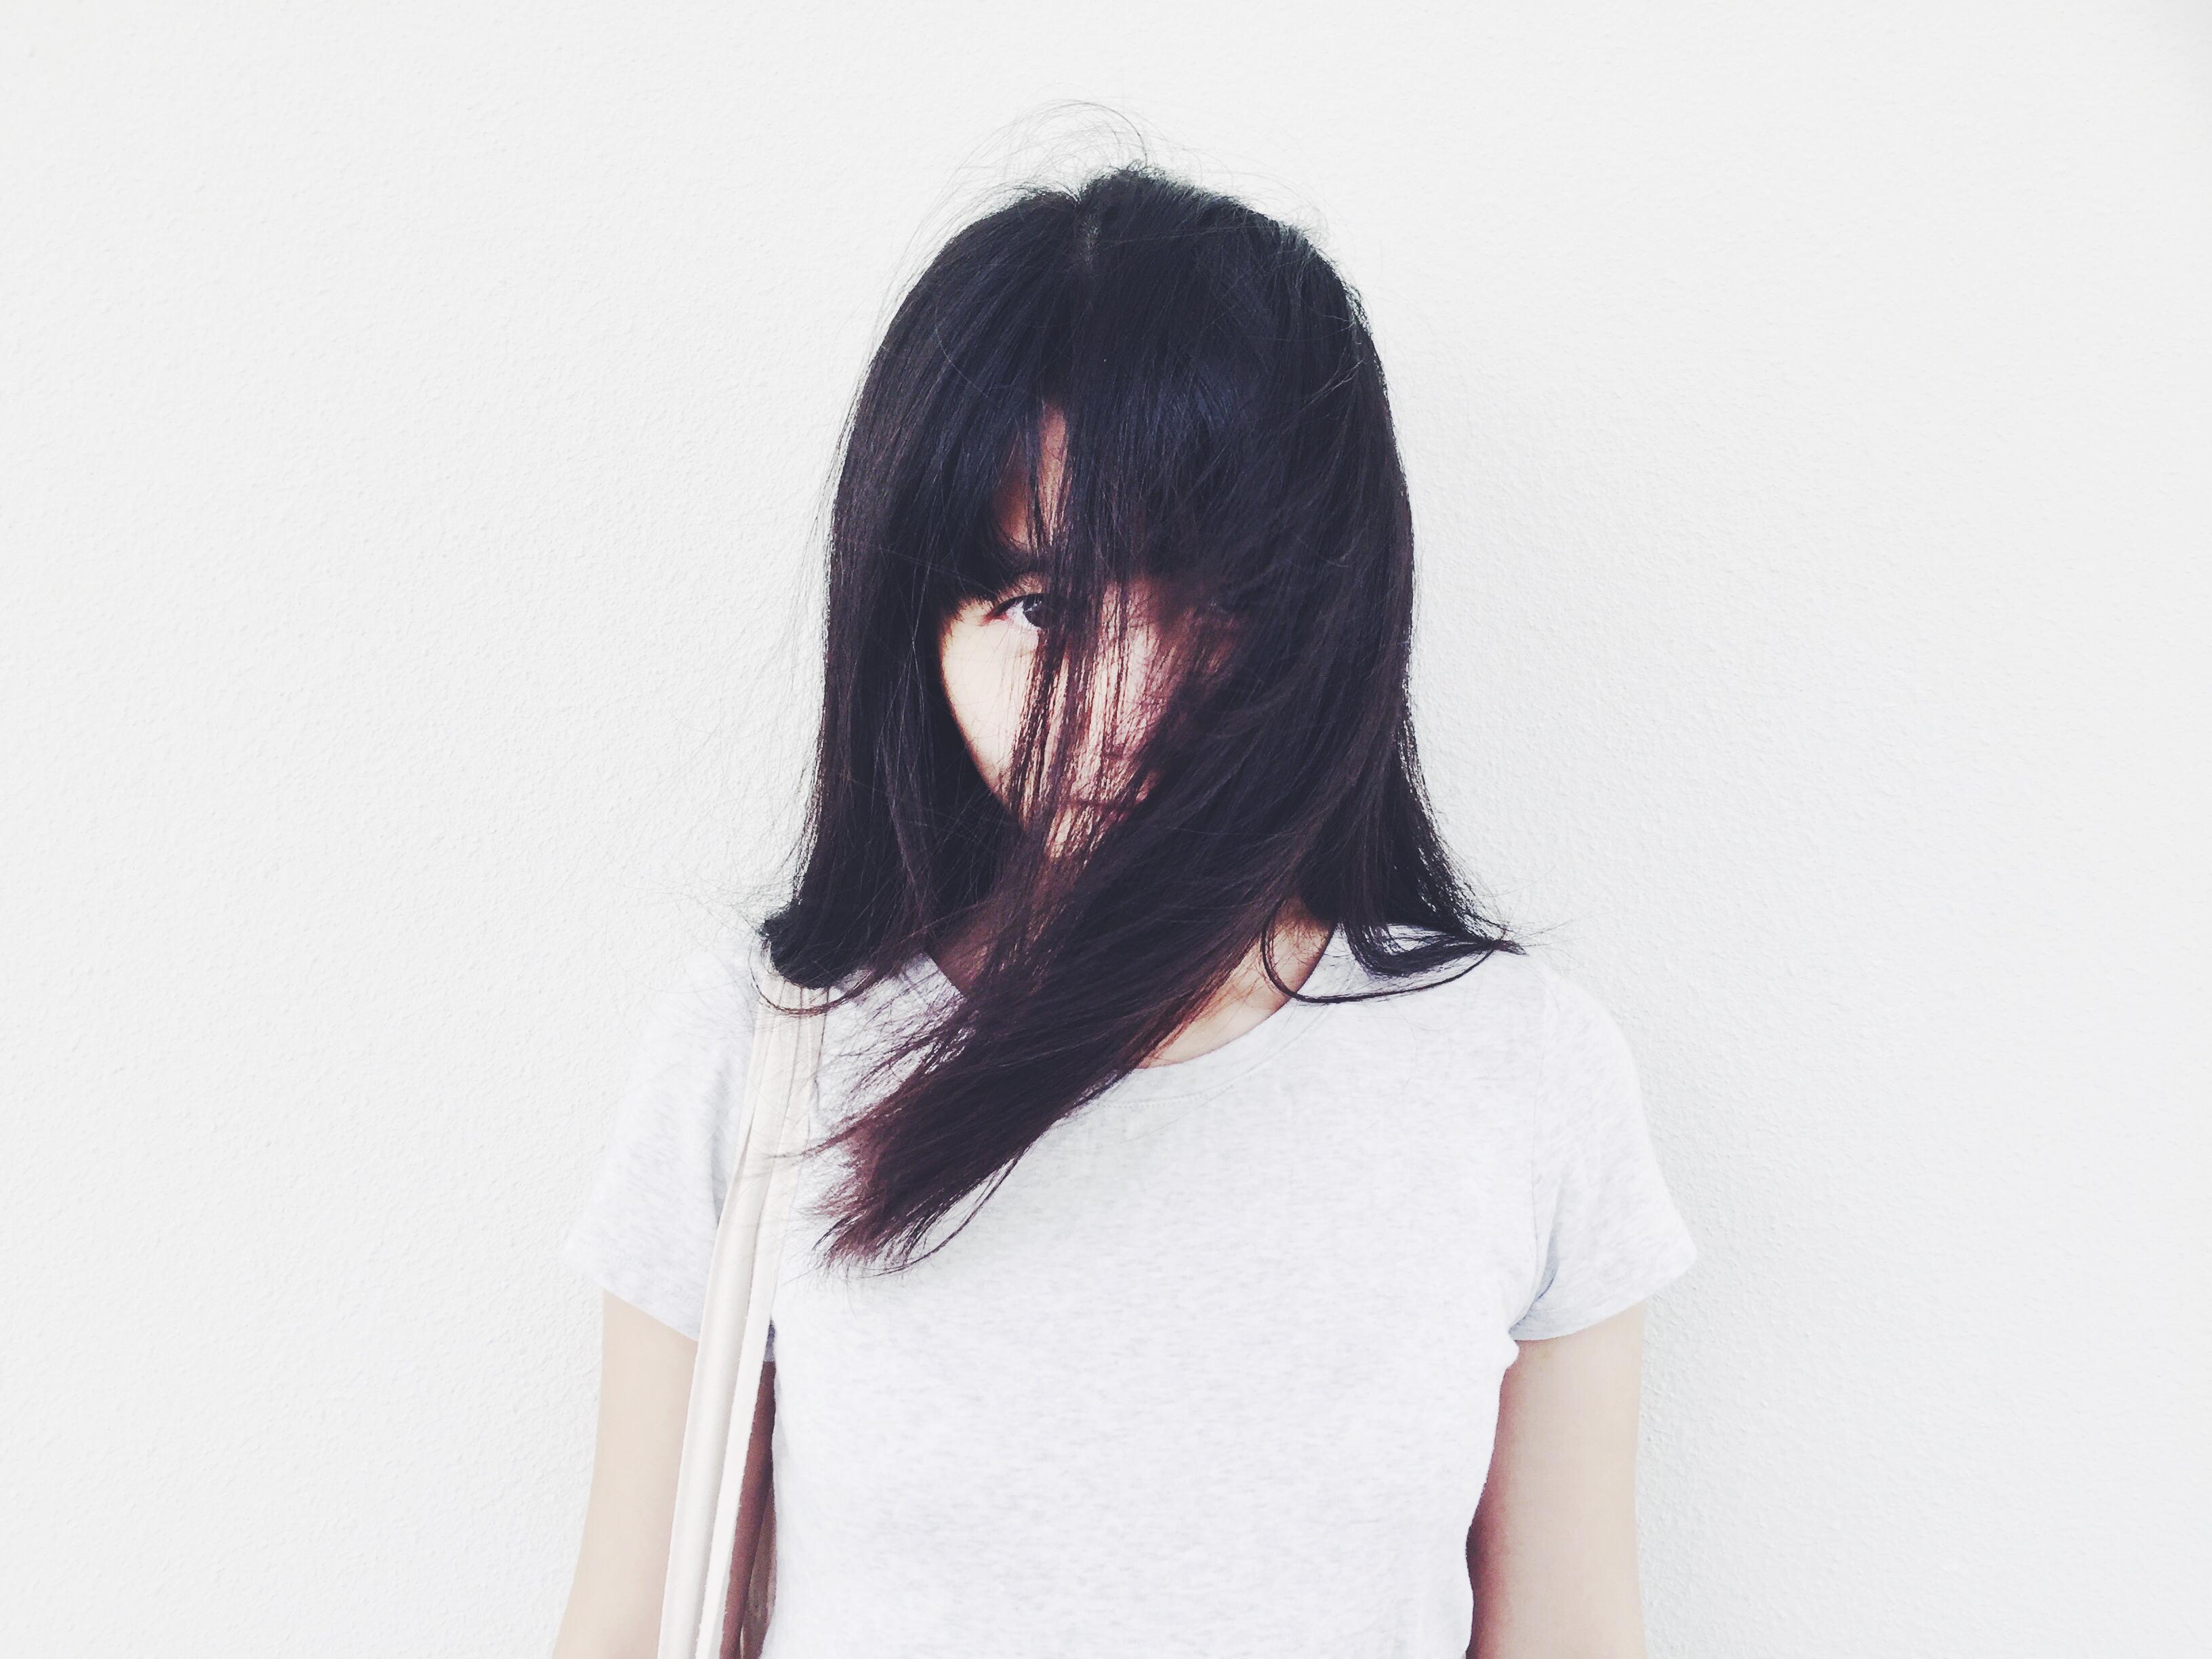 The harmful myth of asian